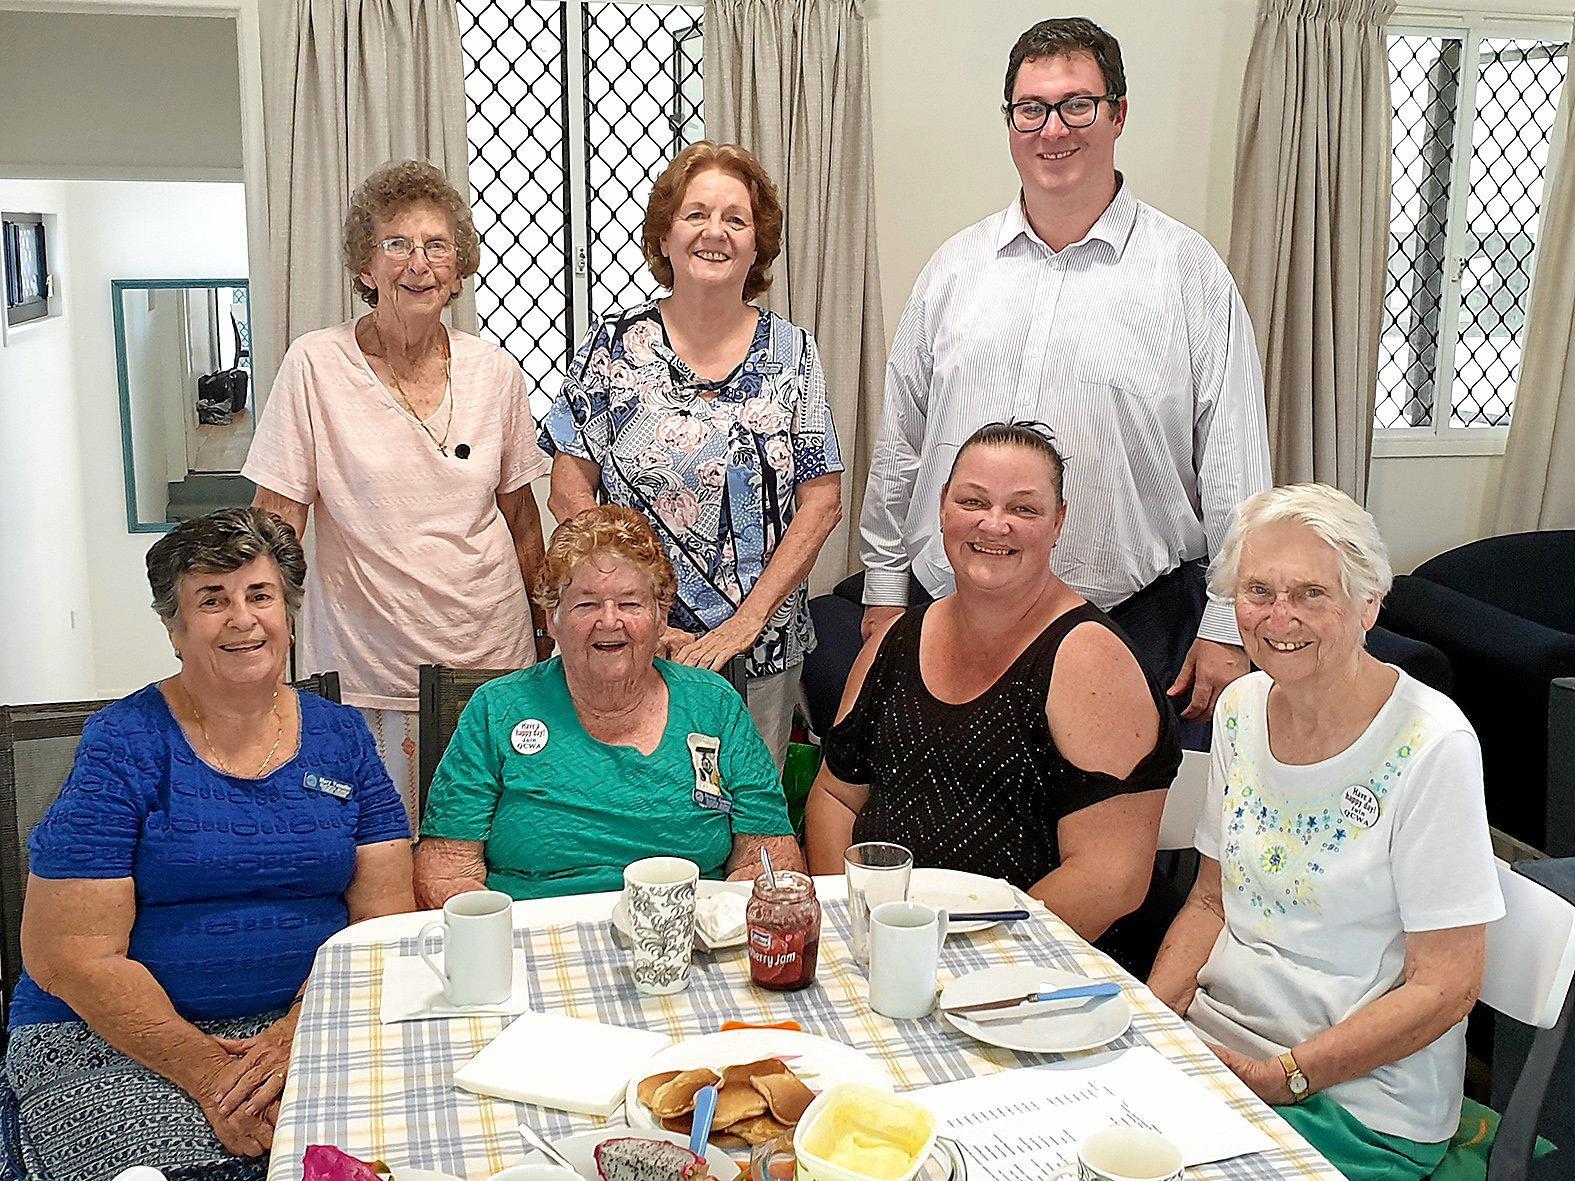 QCWA members, from left, Mary Vassallo, Joan Wright, Denise Gamble, Carol Tandridge, Melissa Van Straten and Beryl Edwards, with Dawson MP George Christensen.